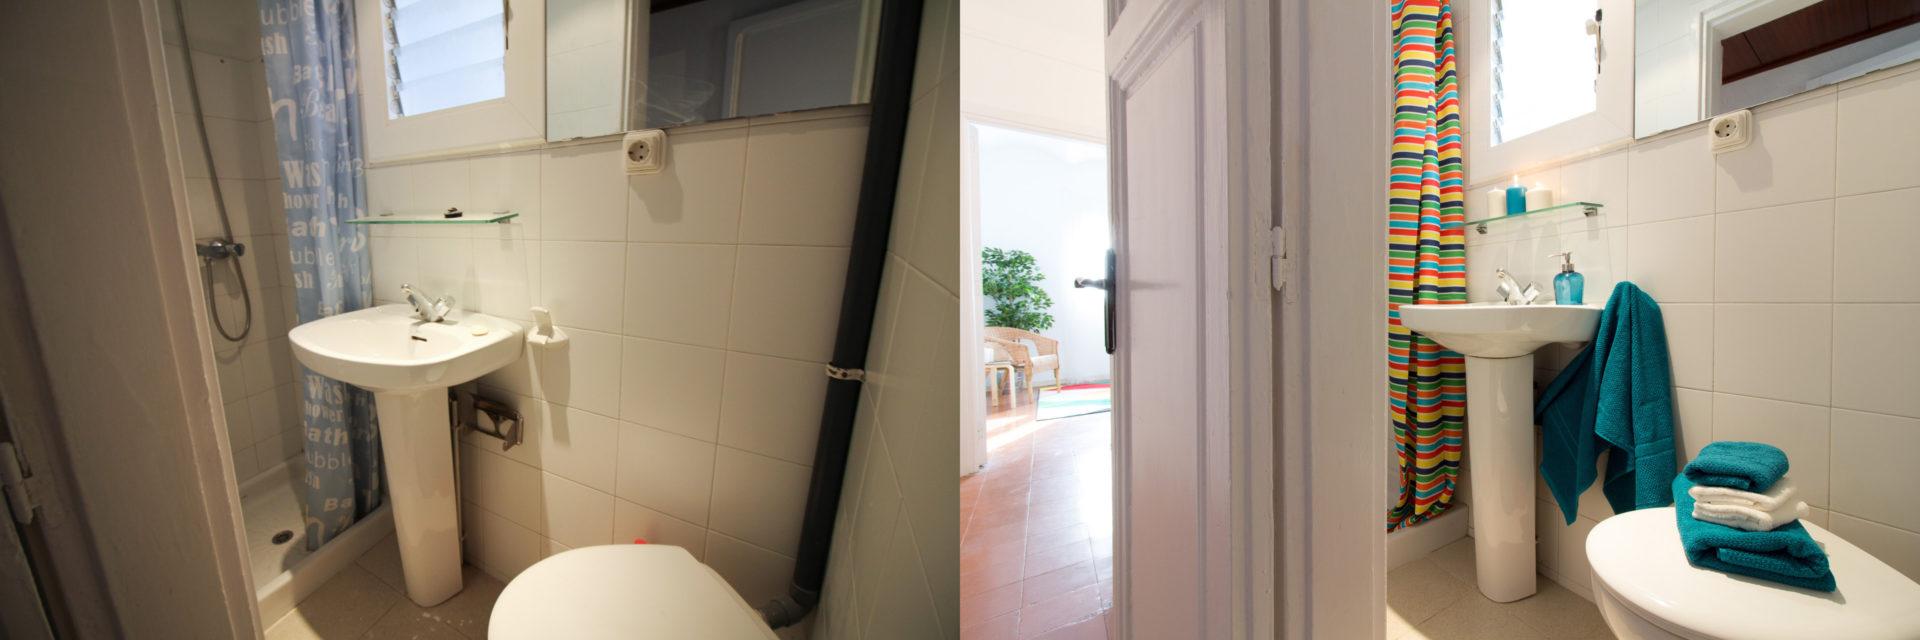 proyecto home staging baño gracia barcelona